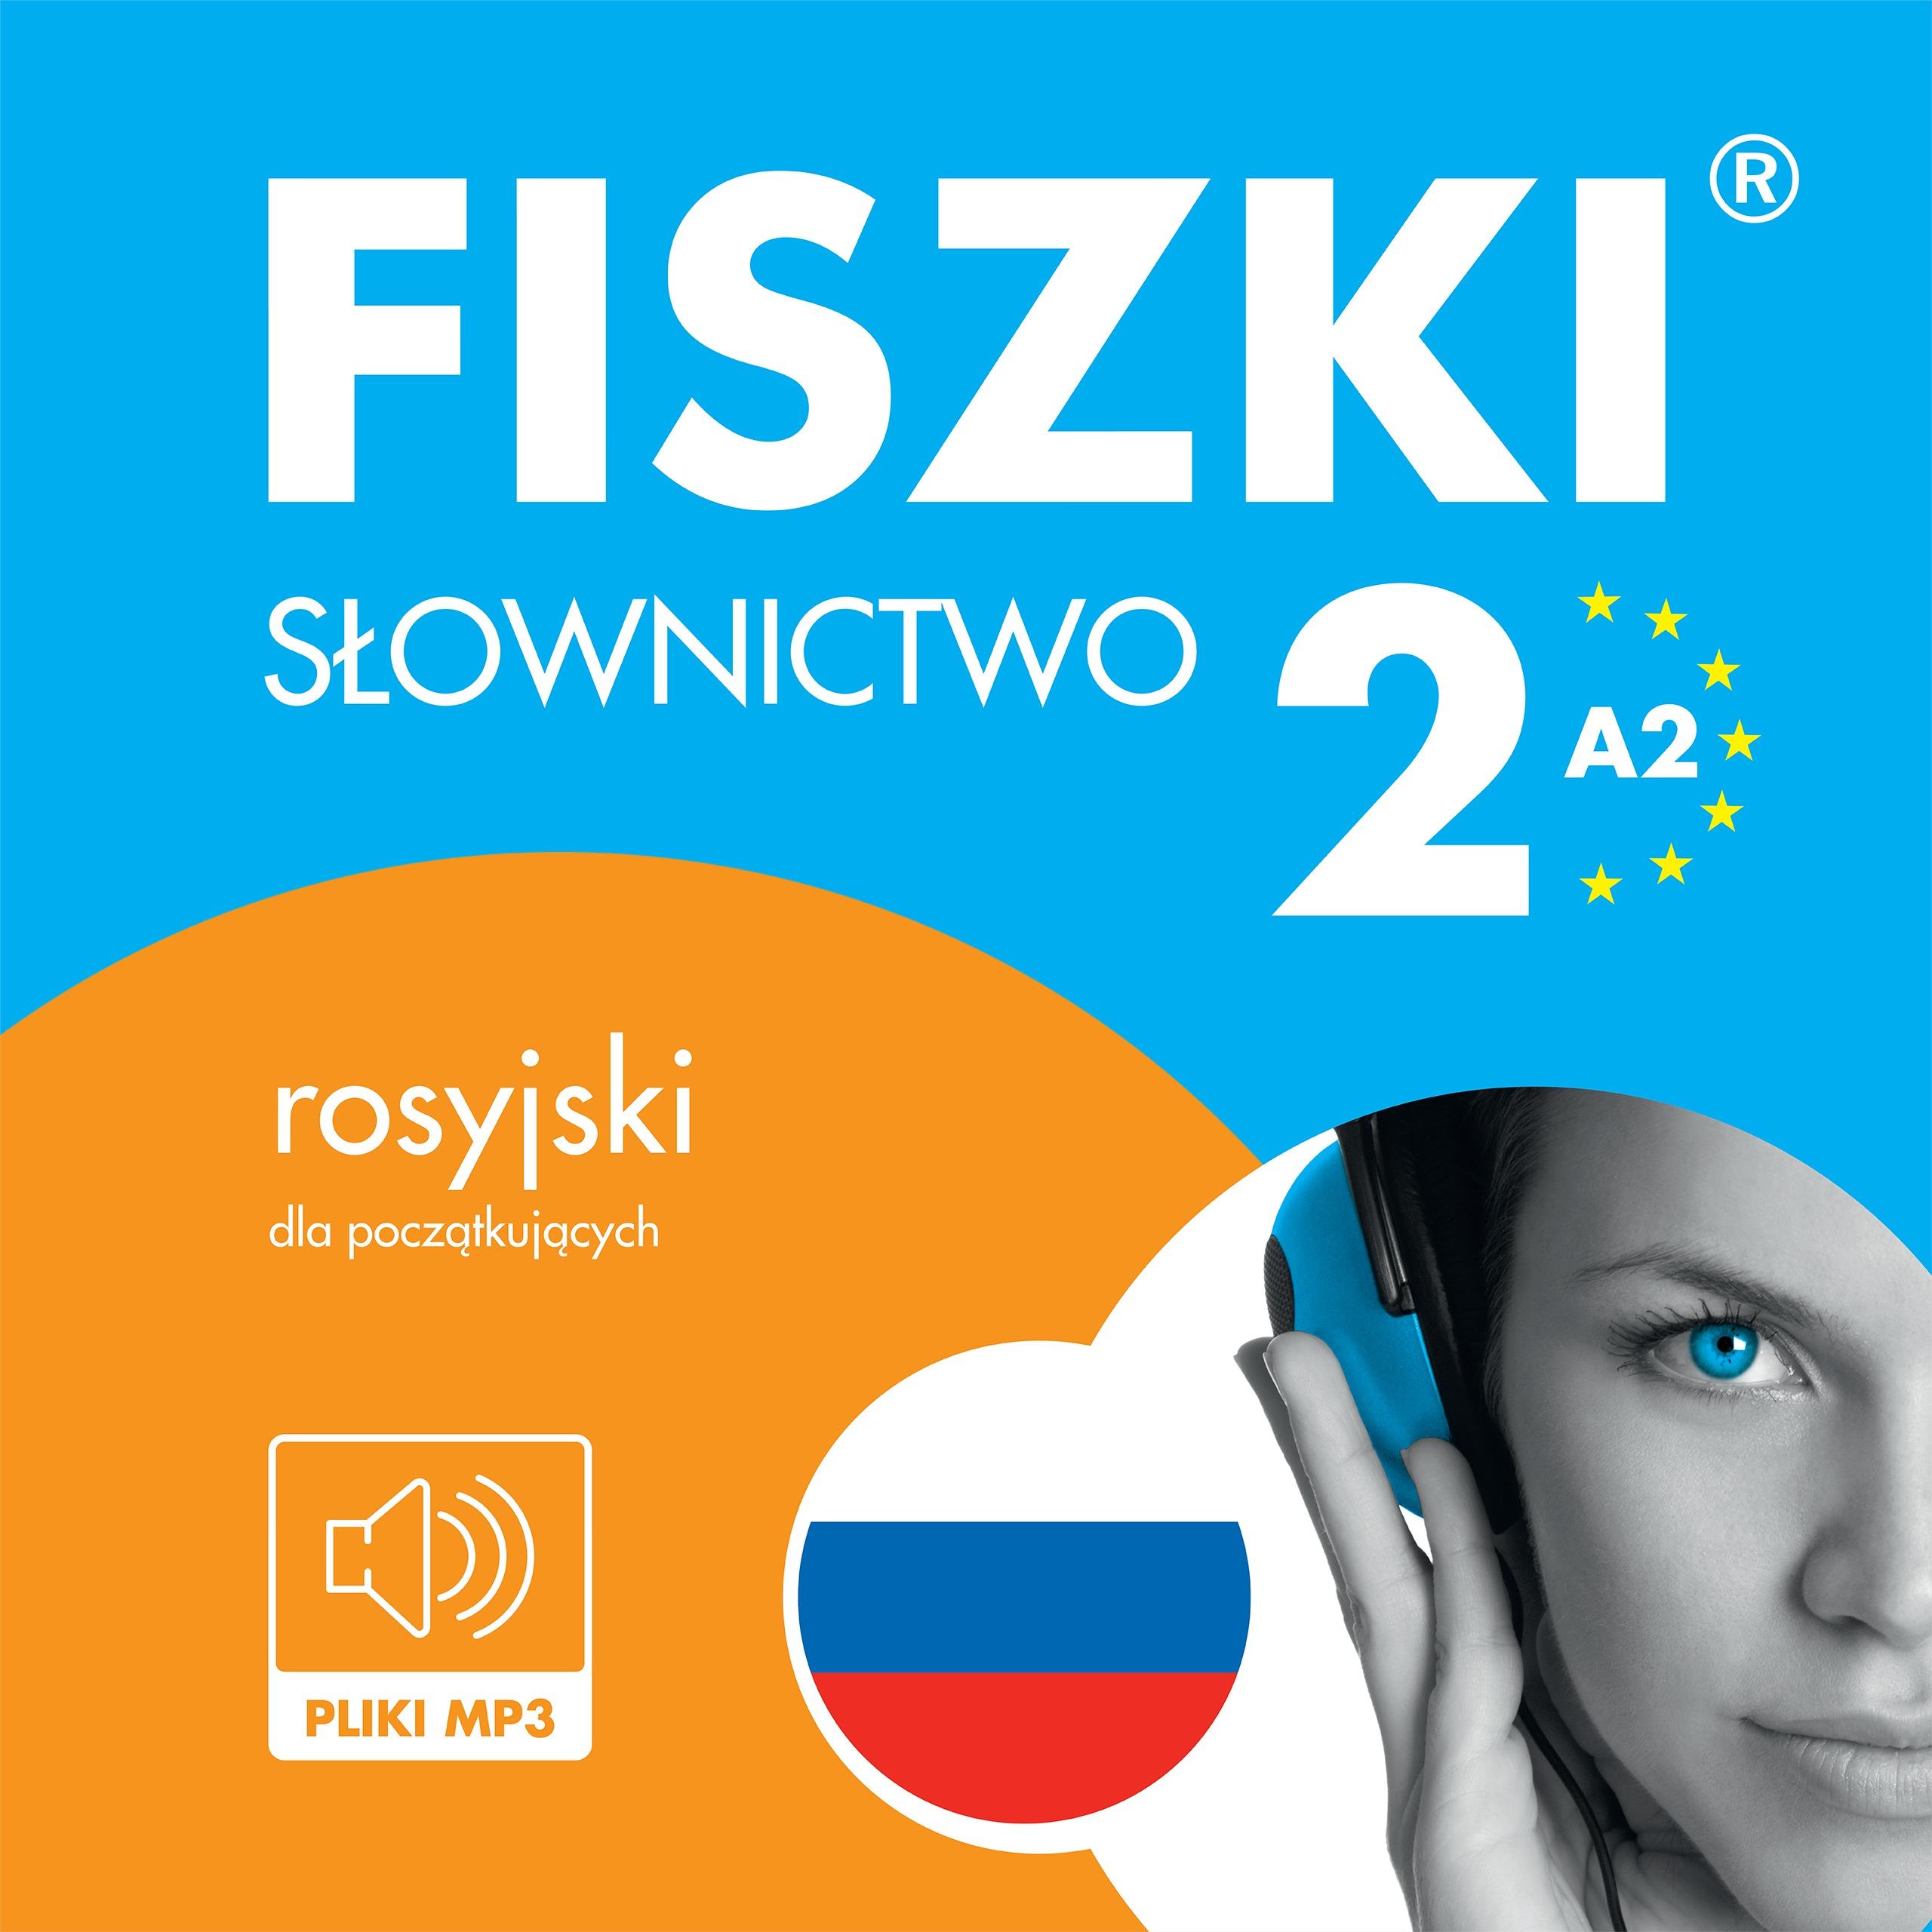 AUDIOBOOK - rosyjski - Słownictwo 2 (A2)